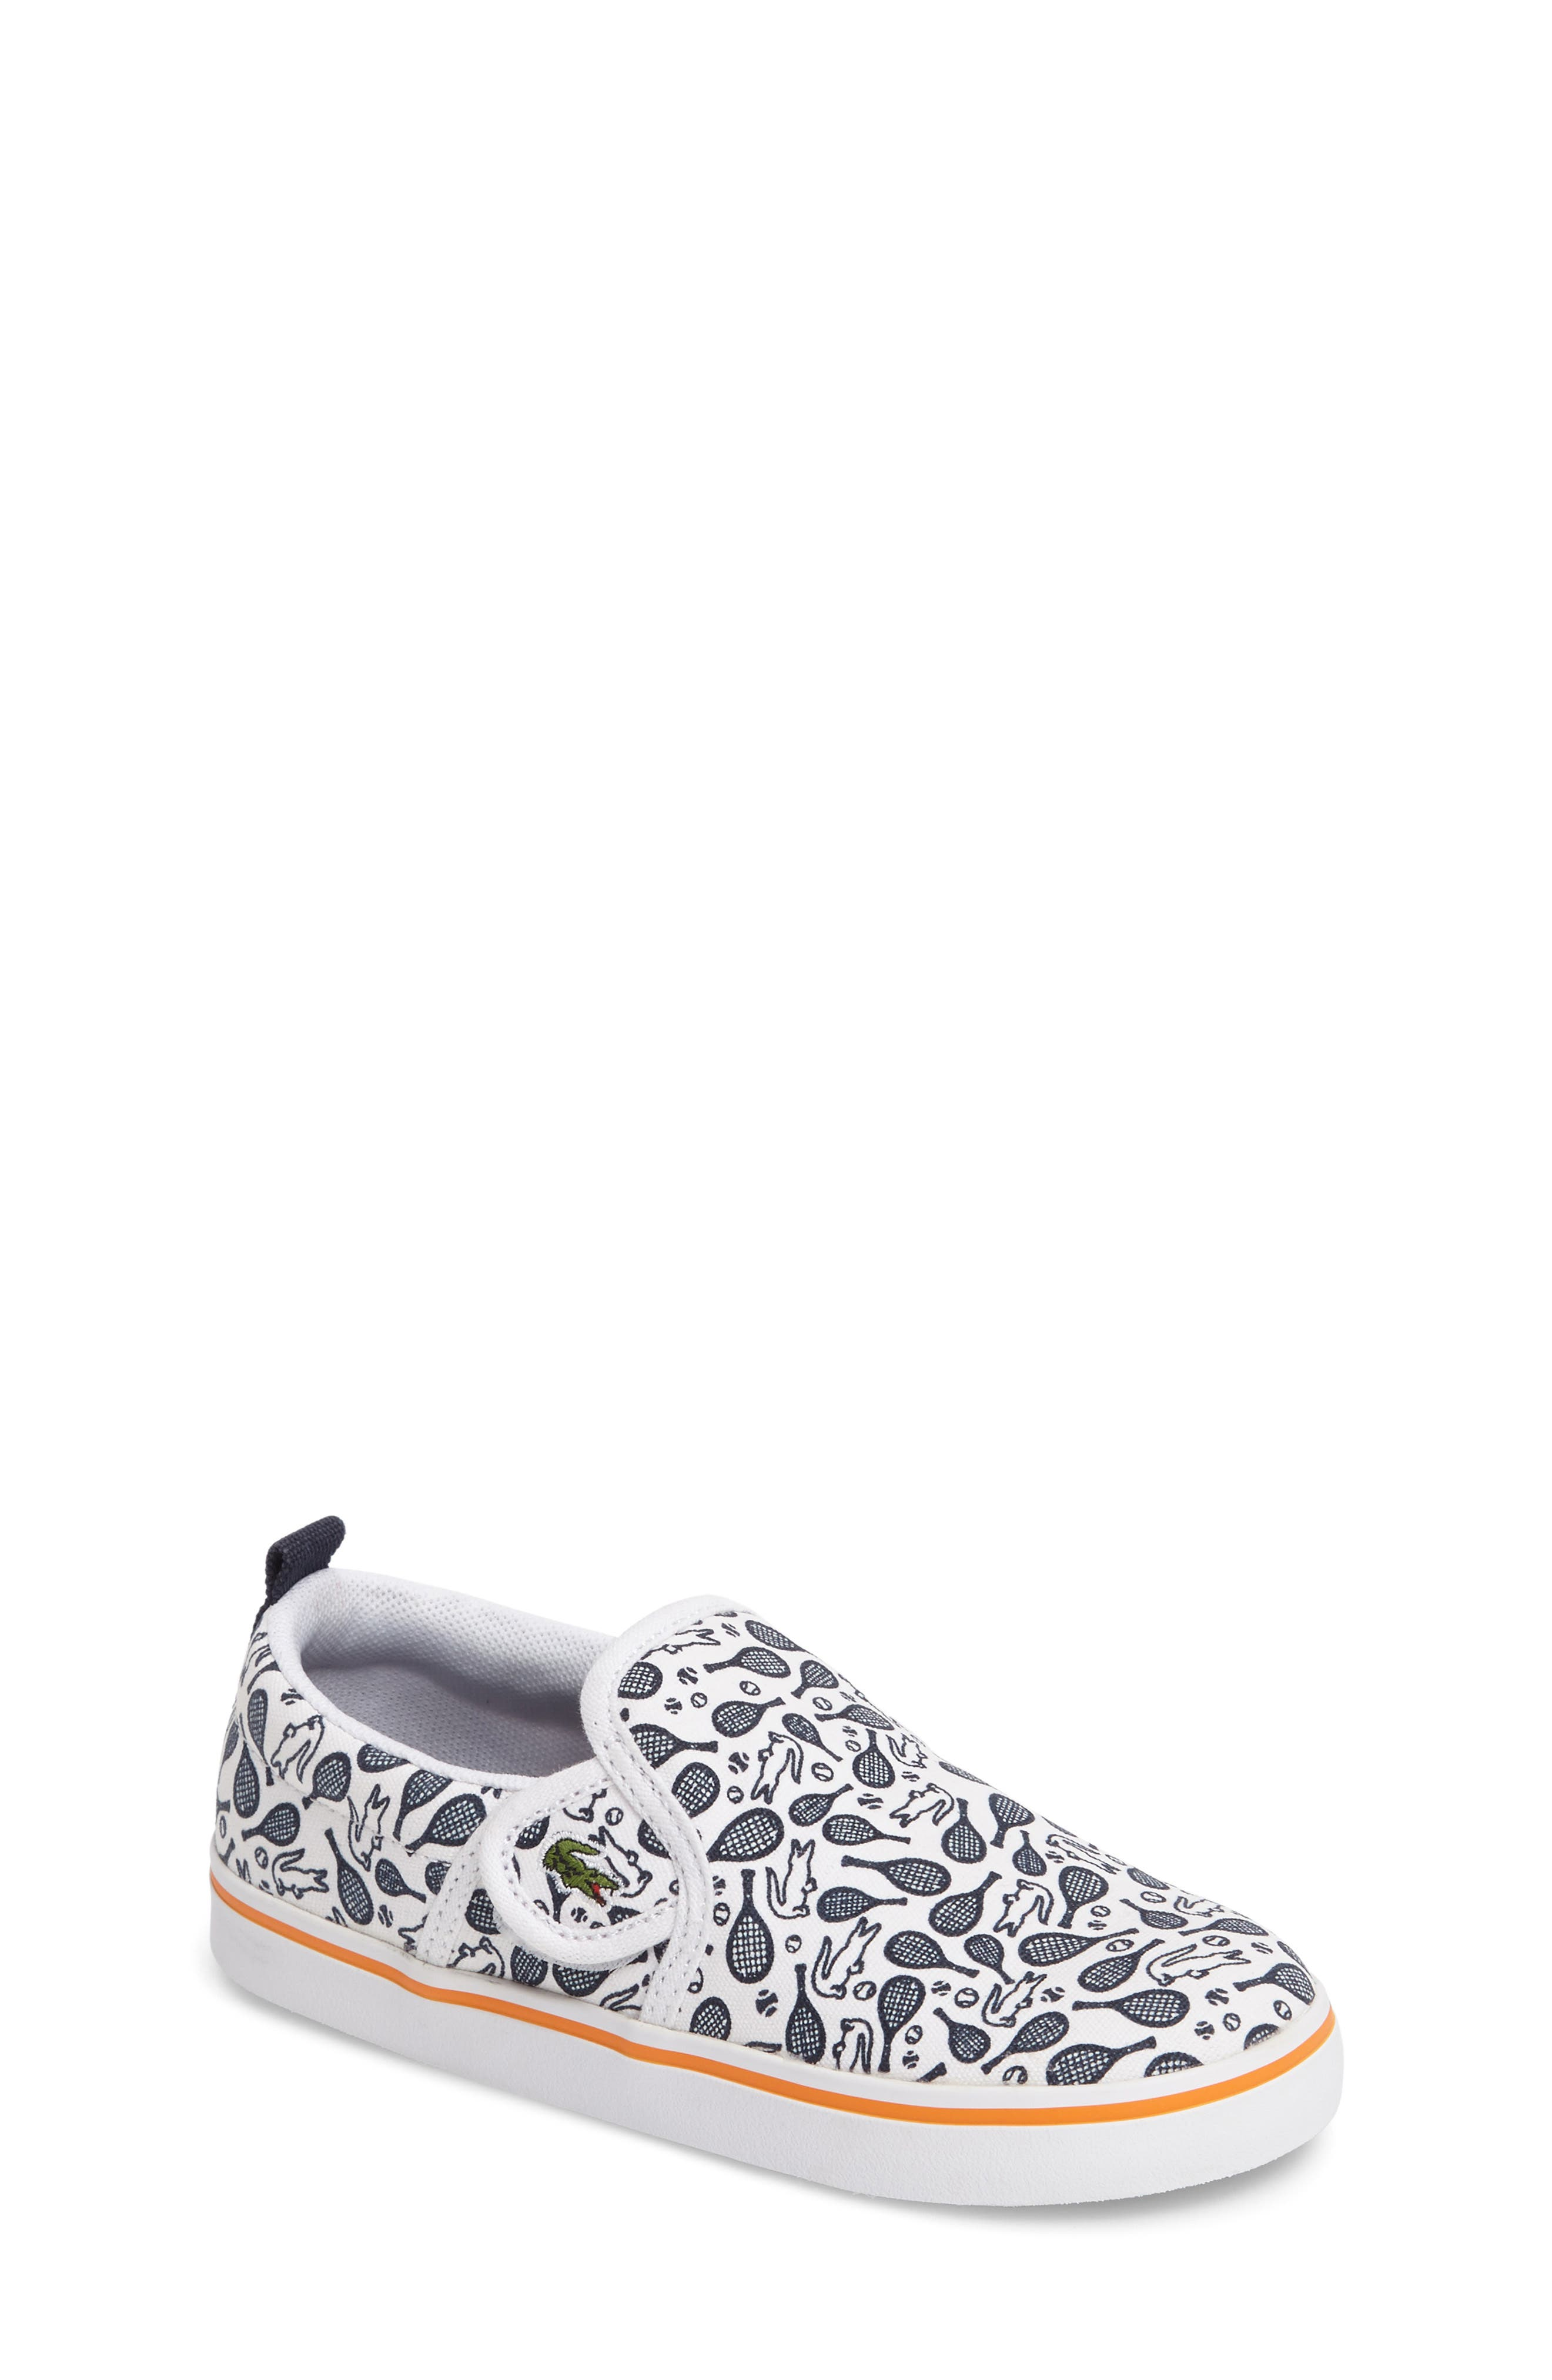 Gazon Slip-On Sneaker,                             Main thumbnail 1, color,                             Navy/ White